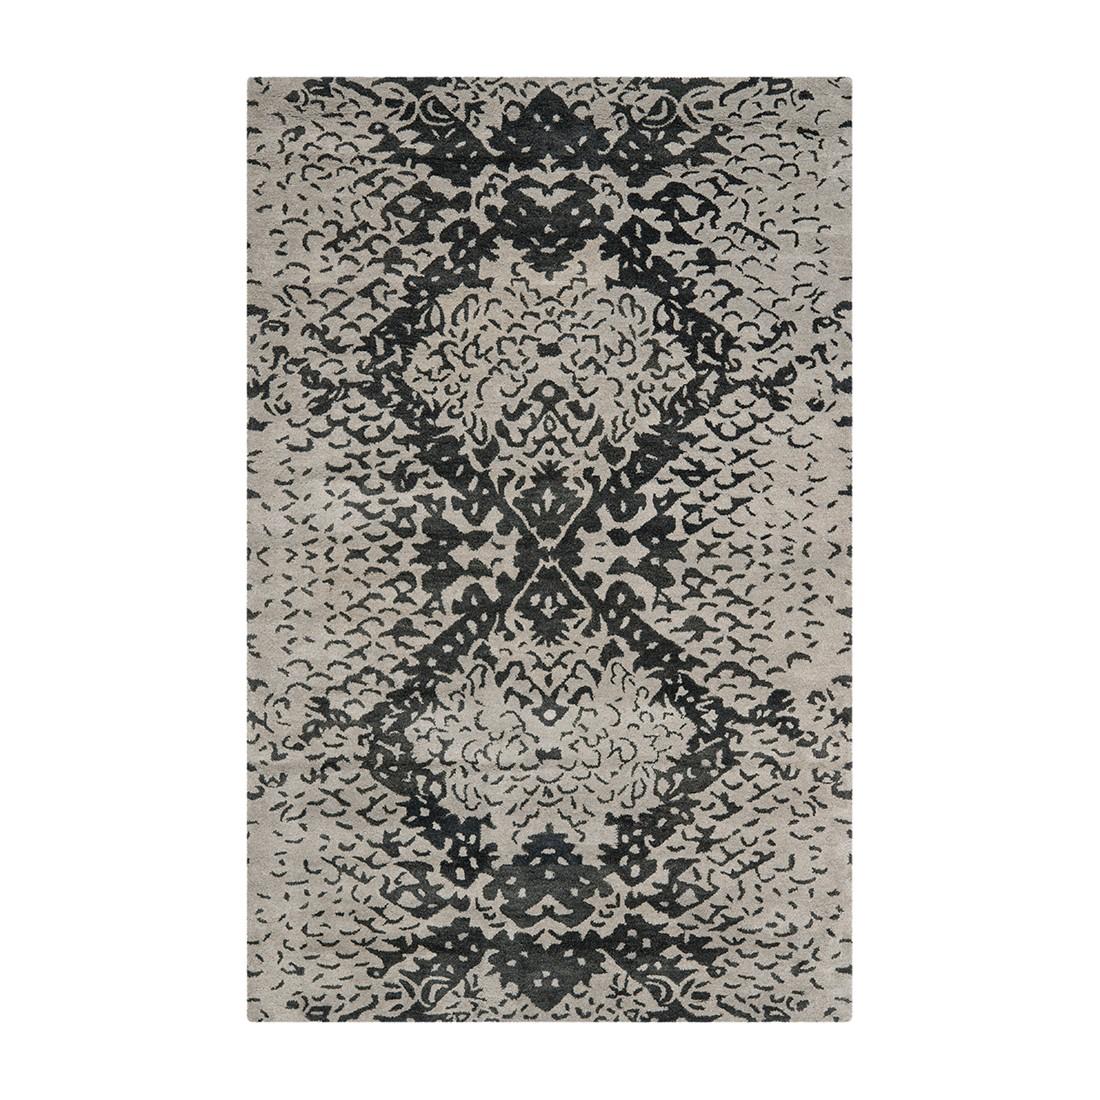 teppich farbe schwarz grau preis vergleich 2016. Black Bedroom Furniture Sets. Home Design Ideas